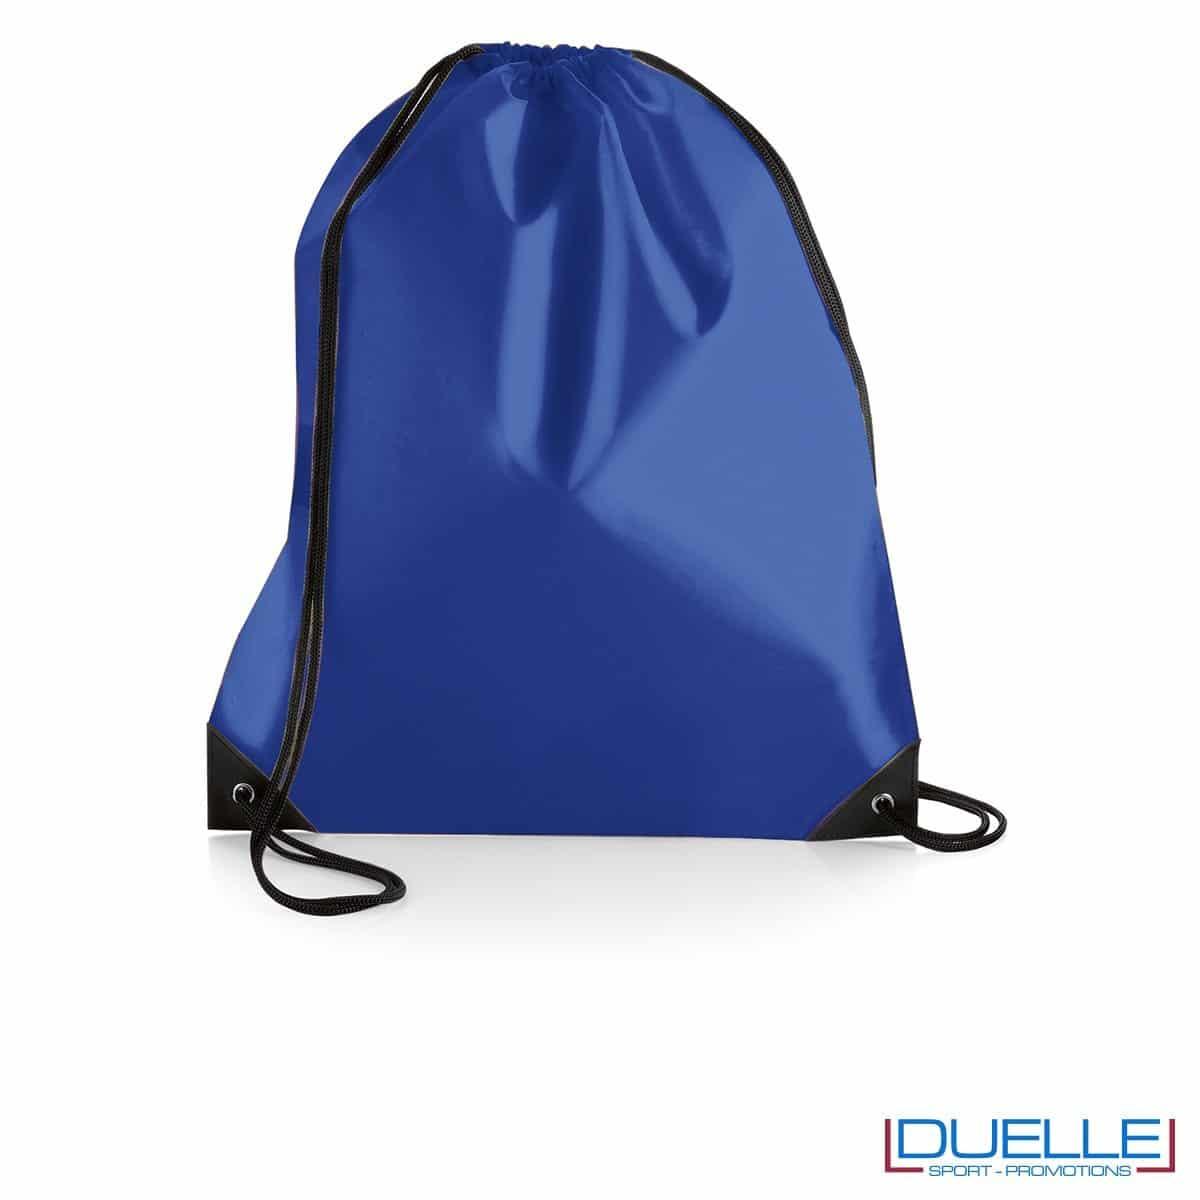 Zainetto impermeabile in nylon blu royal